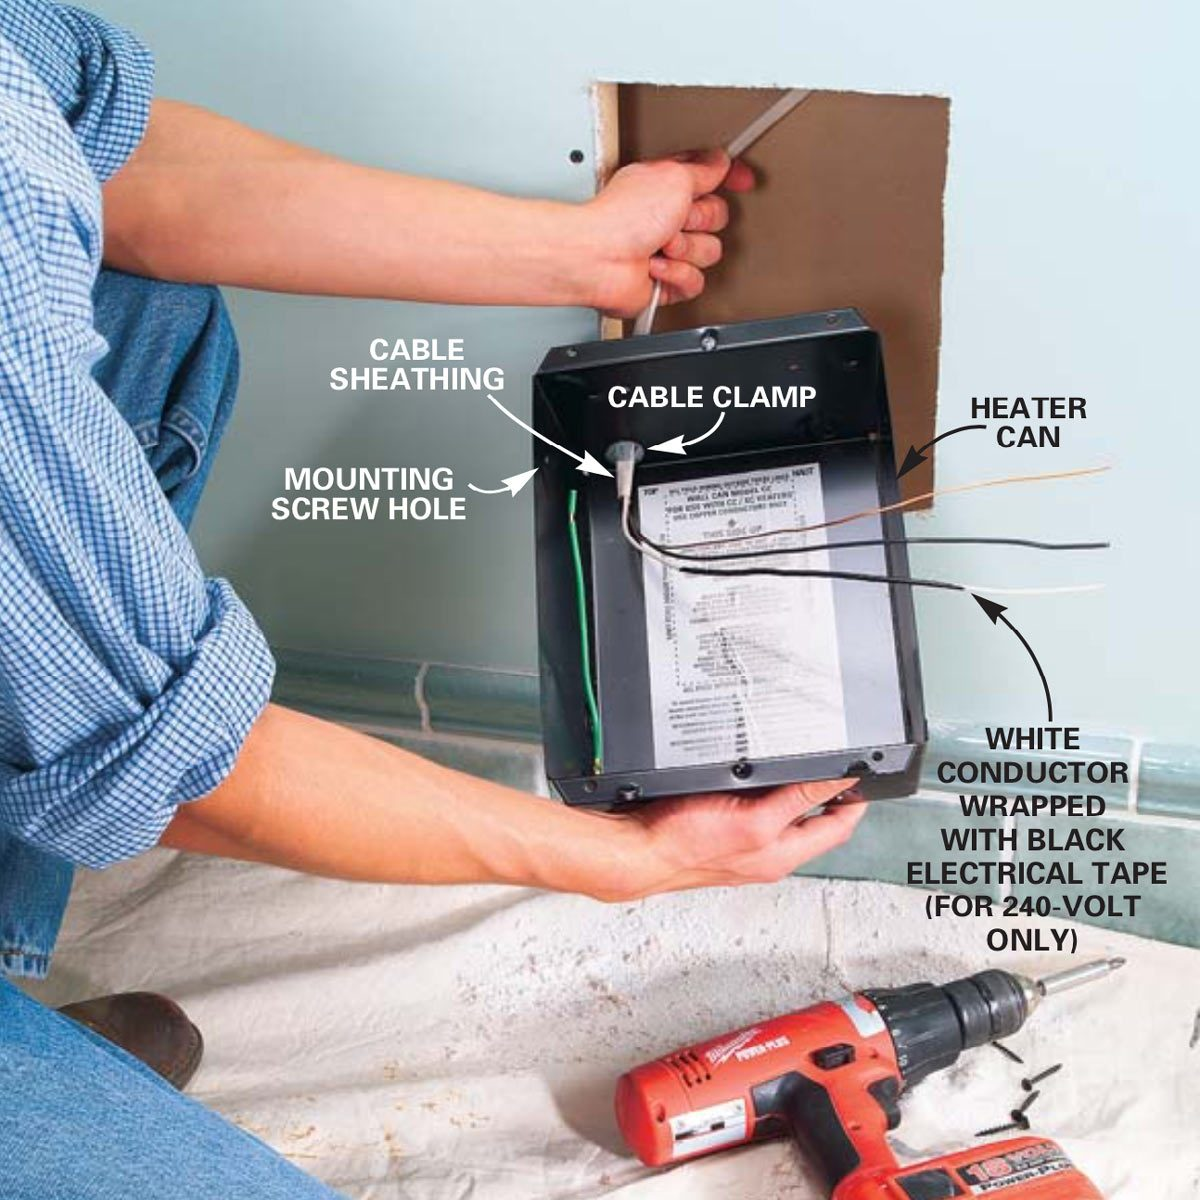 cadet wall heater wiring diagram wiring diagram fascinating wiring cadet wall heaters wiring diagram today cadet wall heater wiring diagram